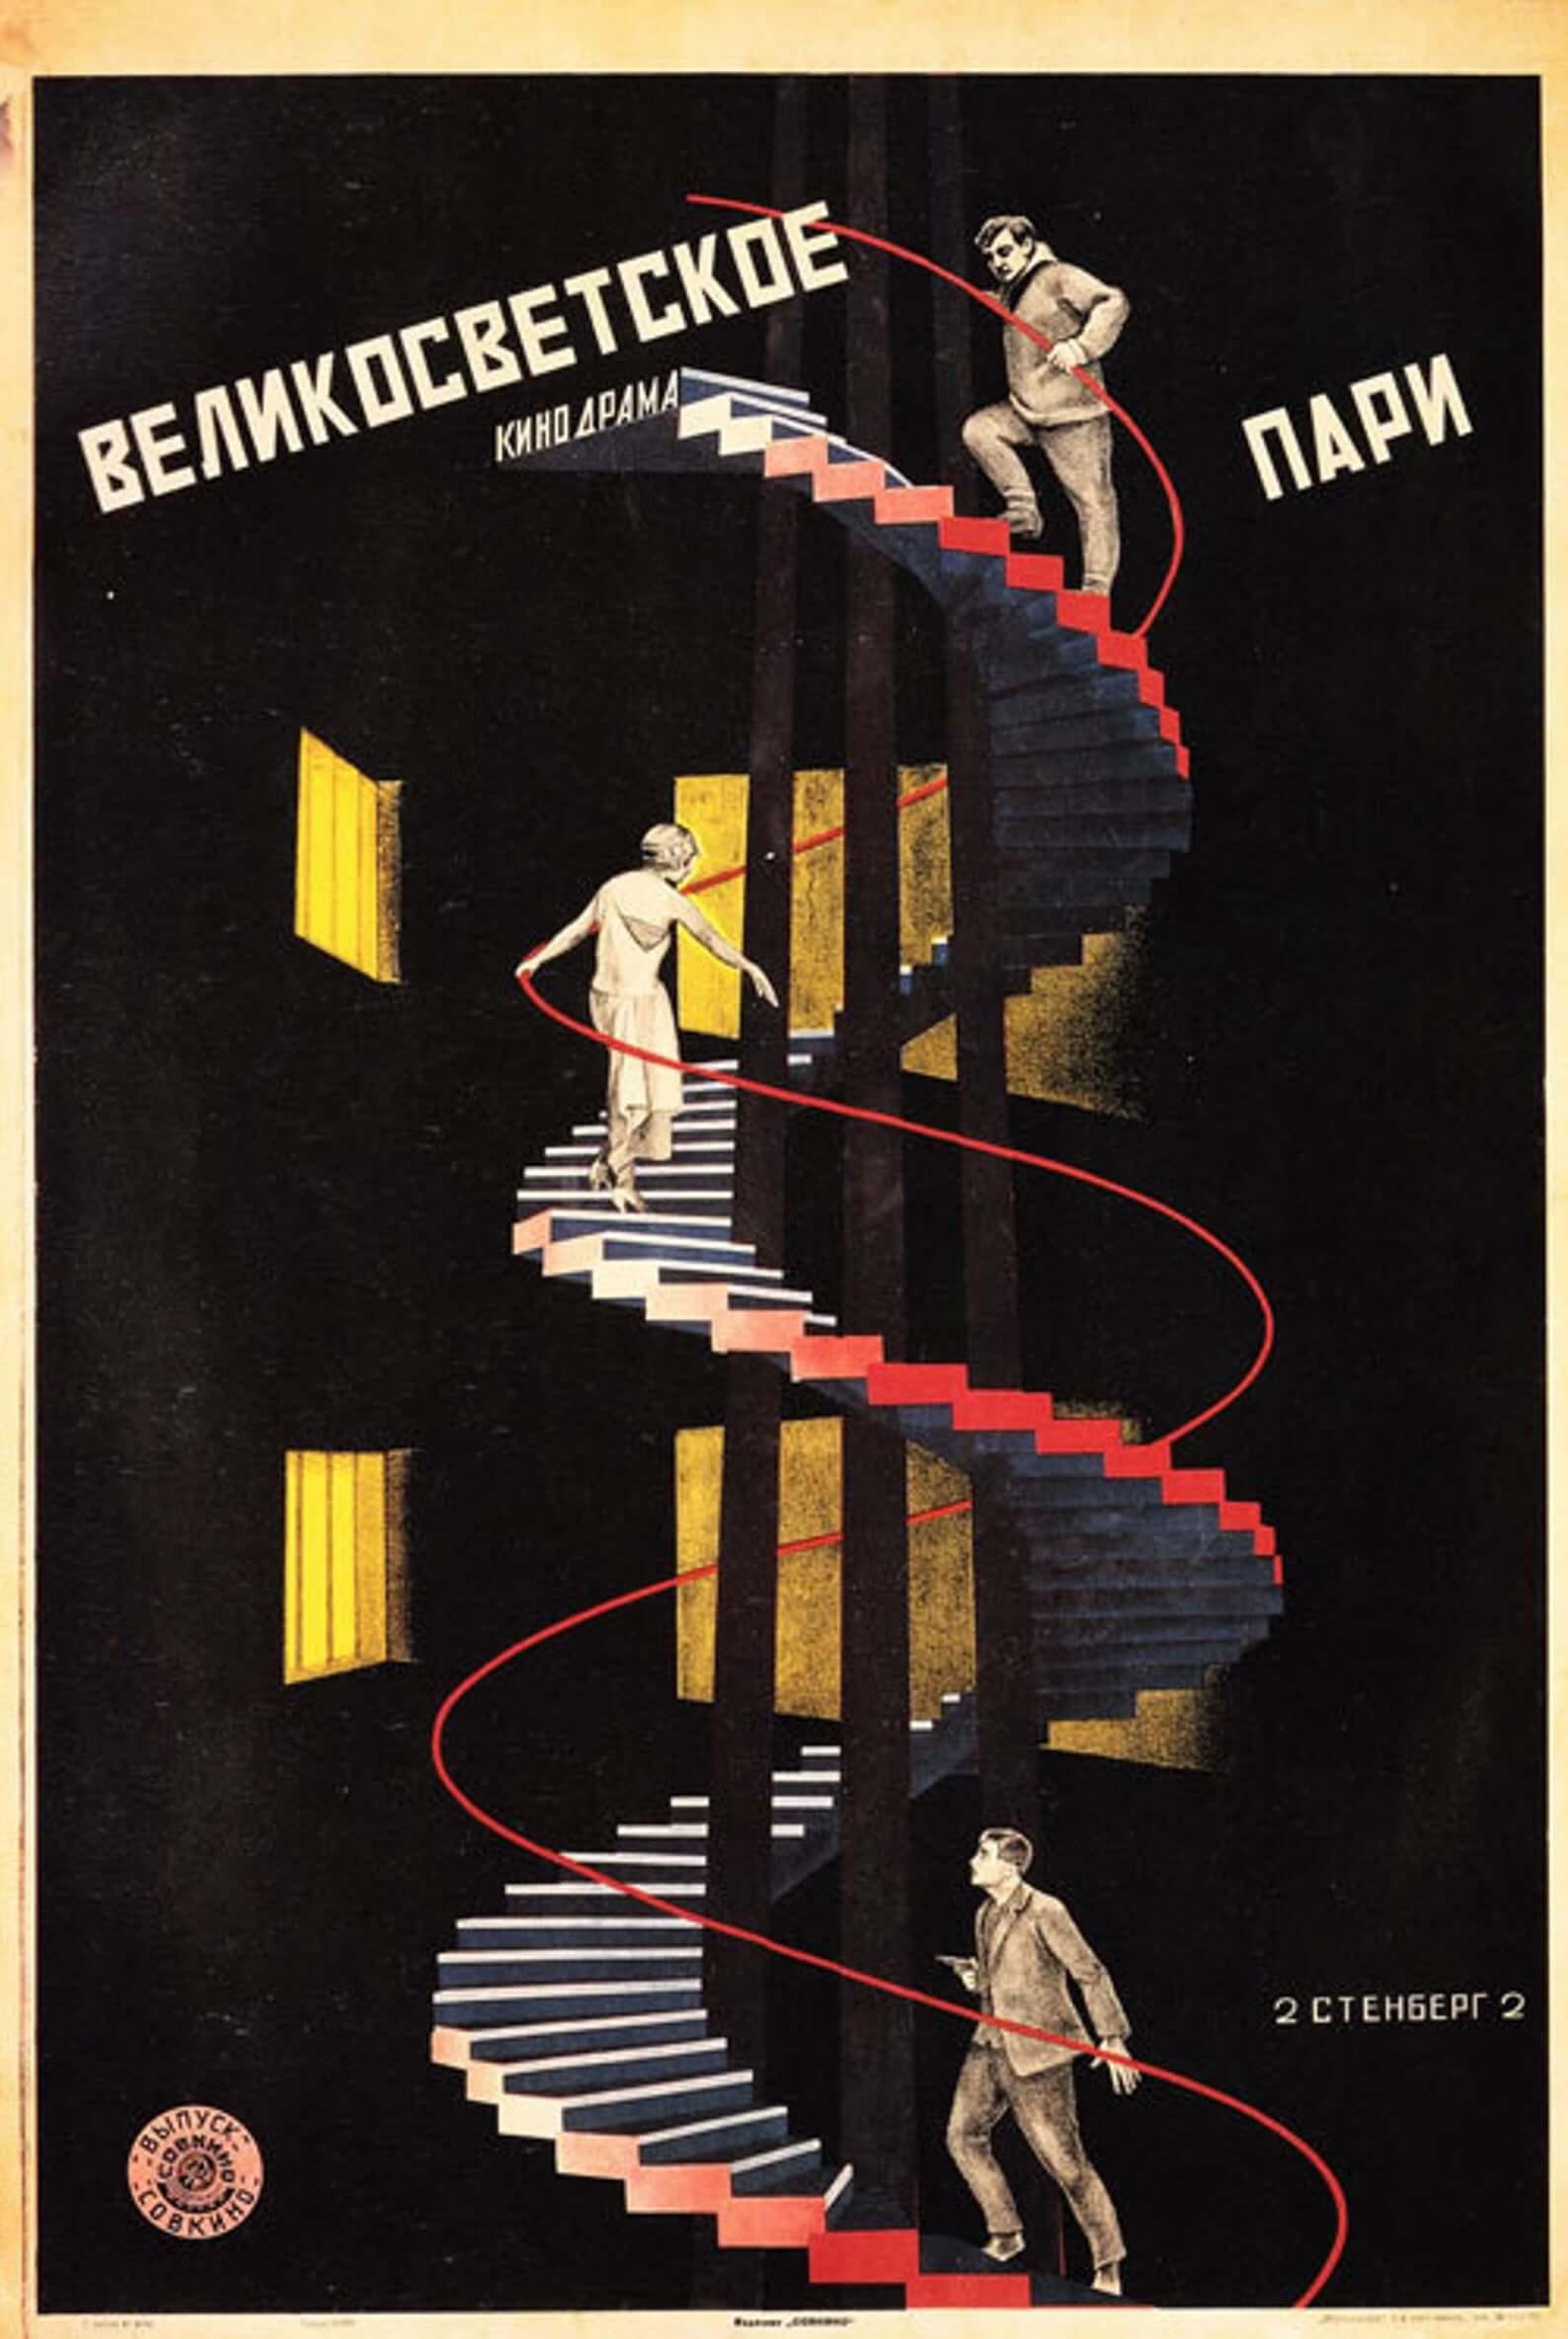 Der Wetterwart, 1923 Poster by the Stenberg brothers